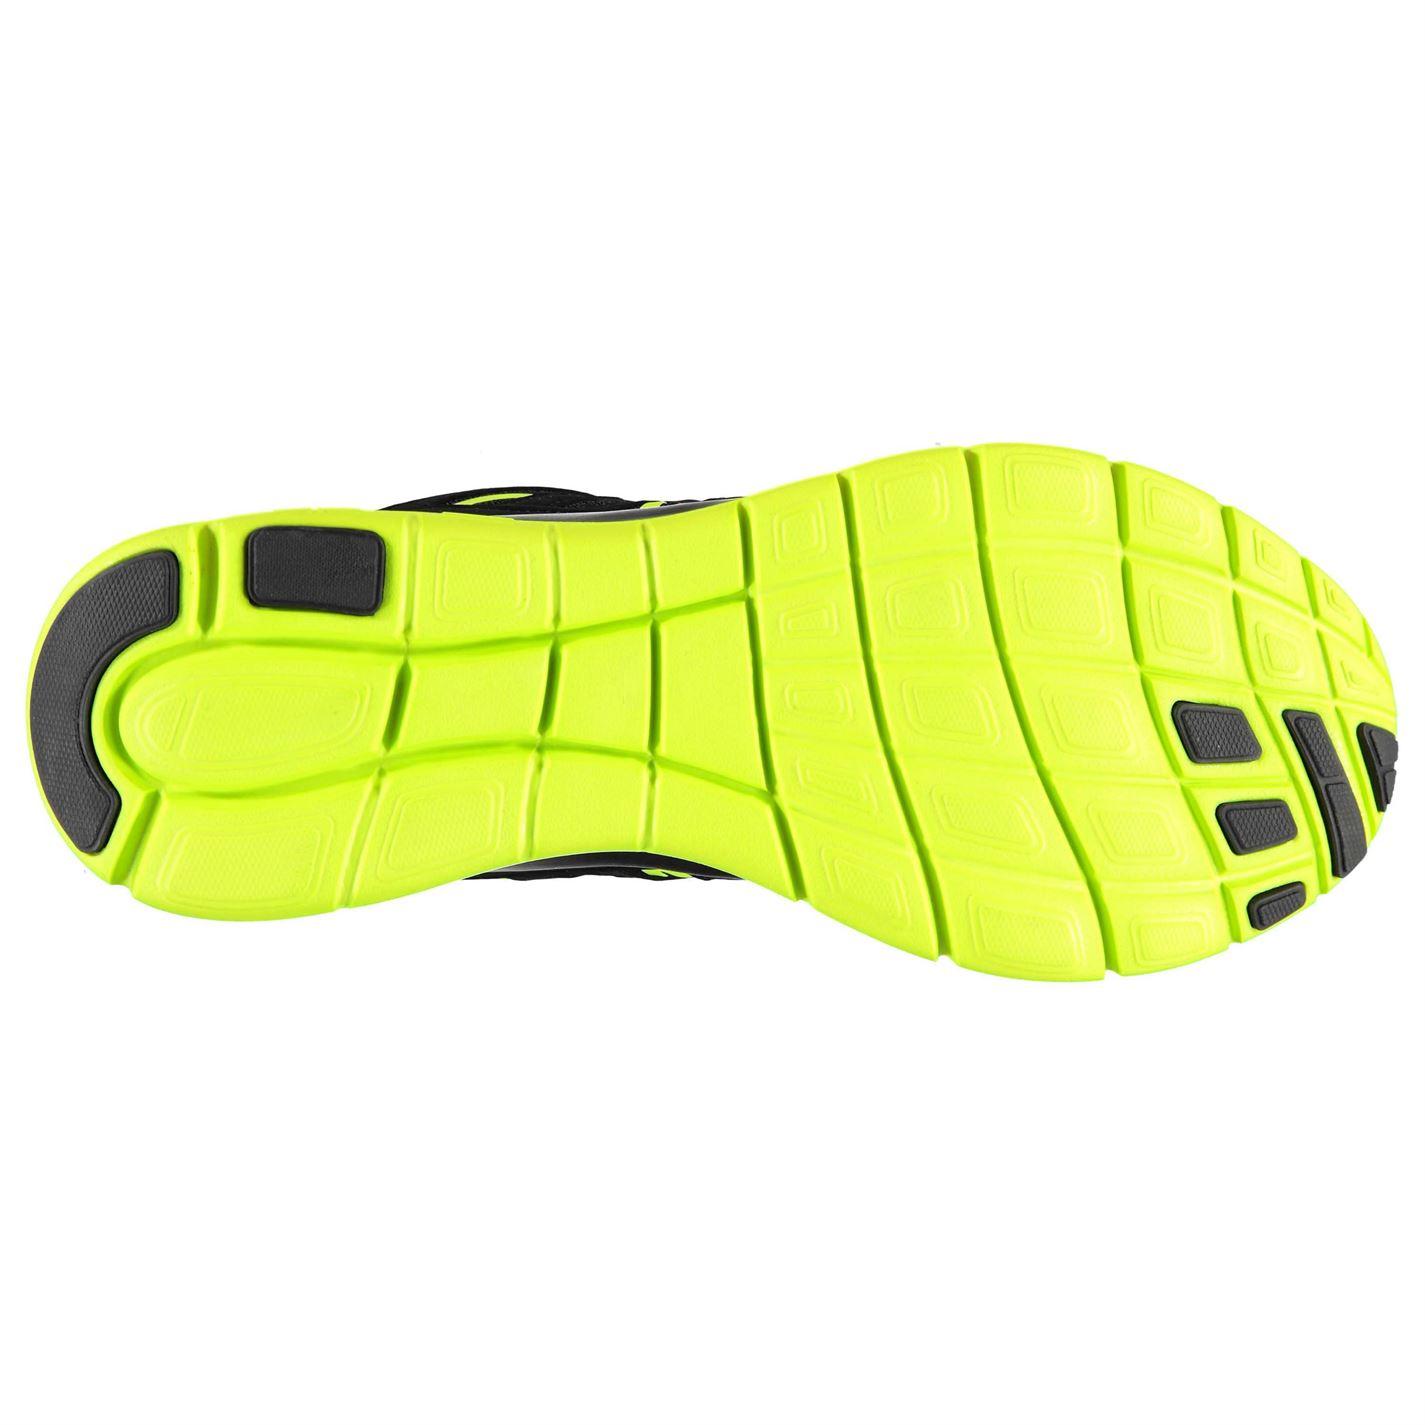 Karrimor-Mens-Duma-Trainers-Lace-Up-Sports-Running-Cross-Training-Shoes thumbnail 29